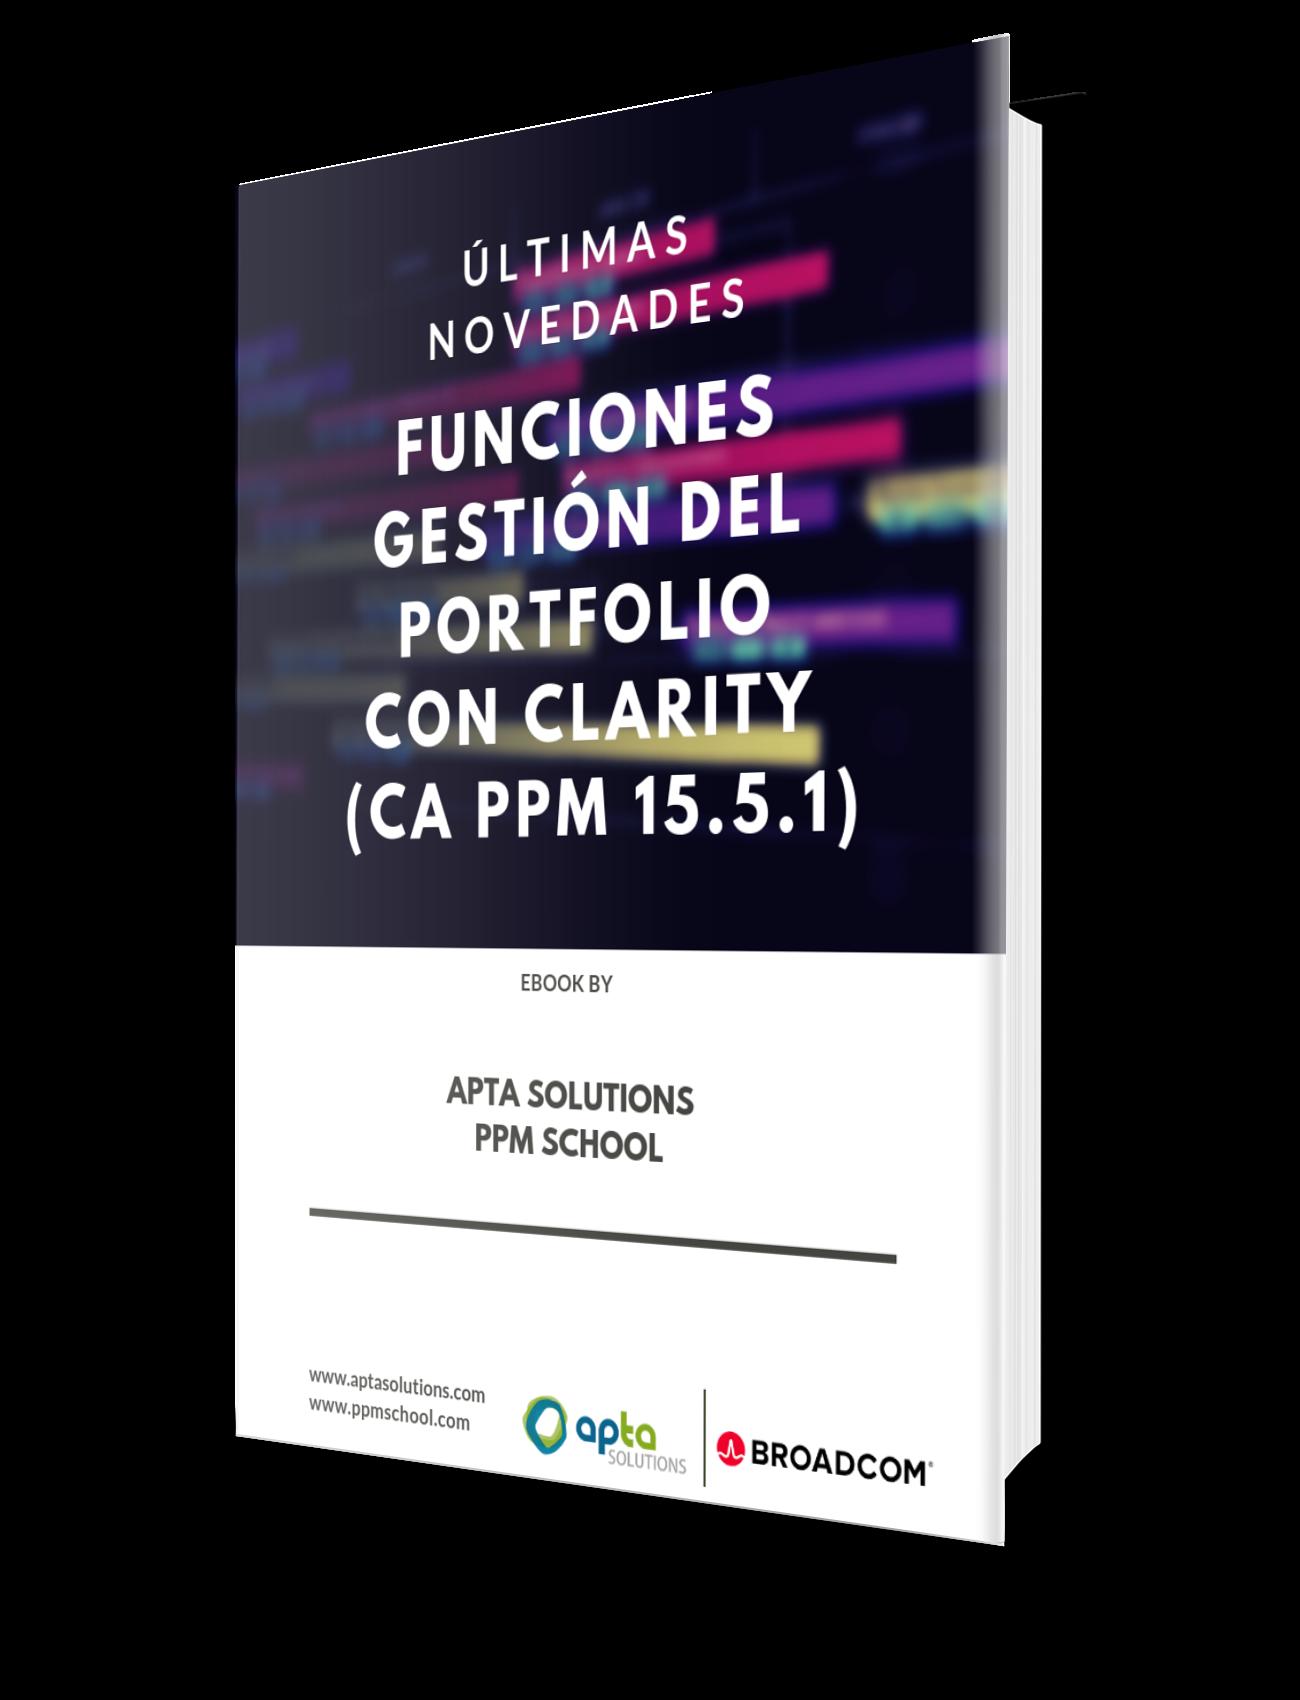 Clarity (CA PPM) 15.5.1 E-book